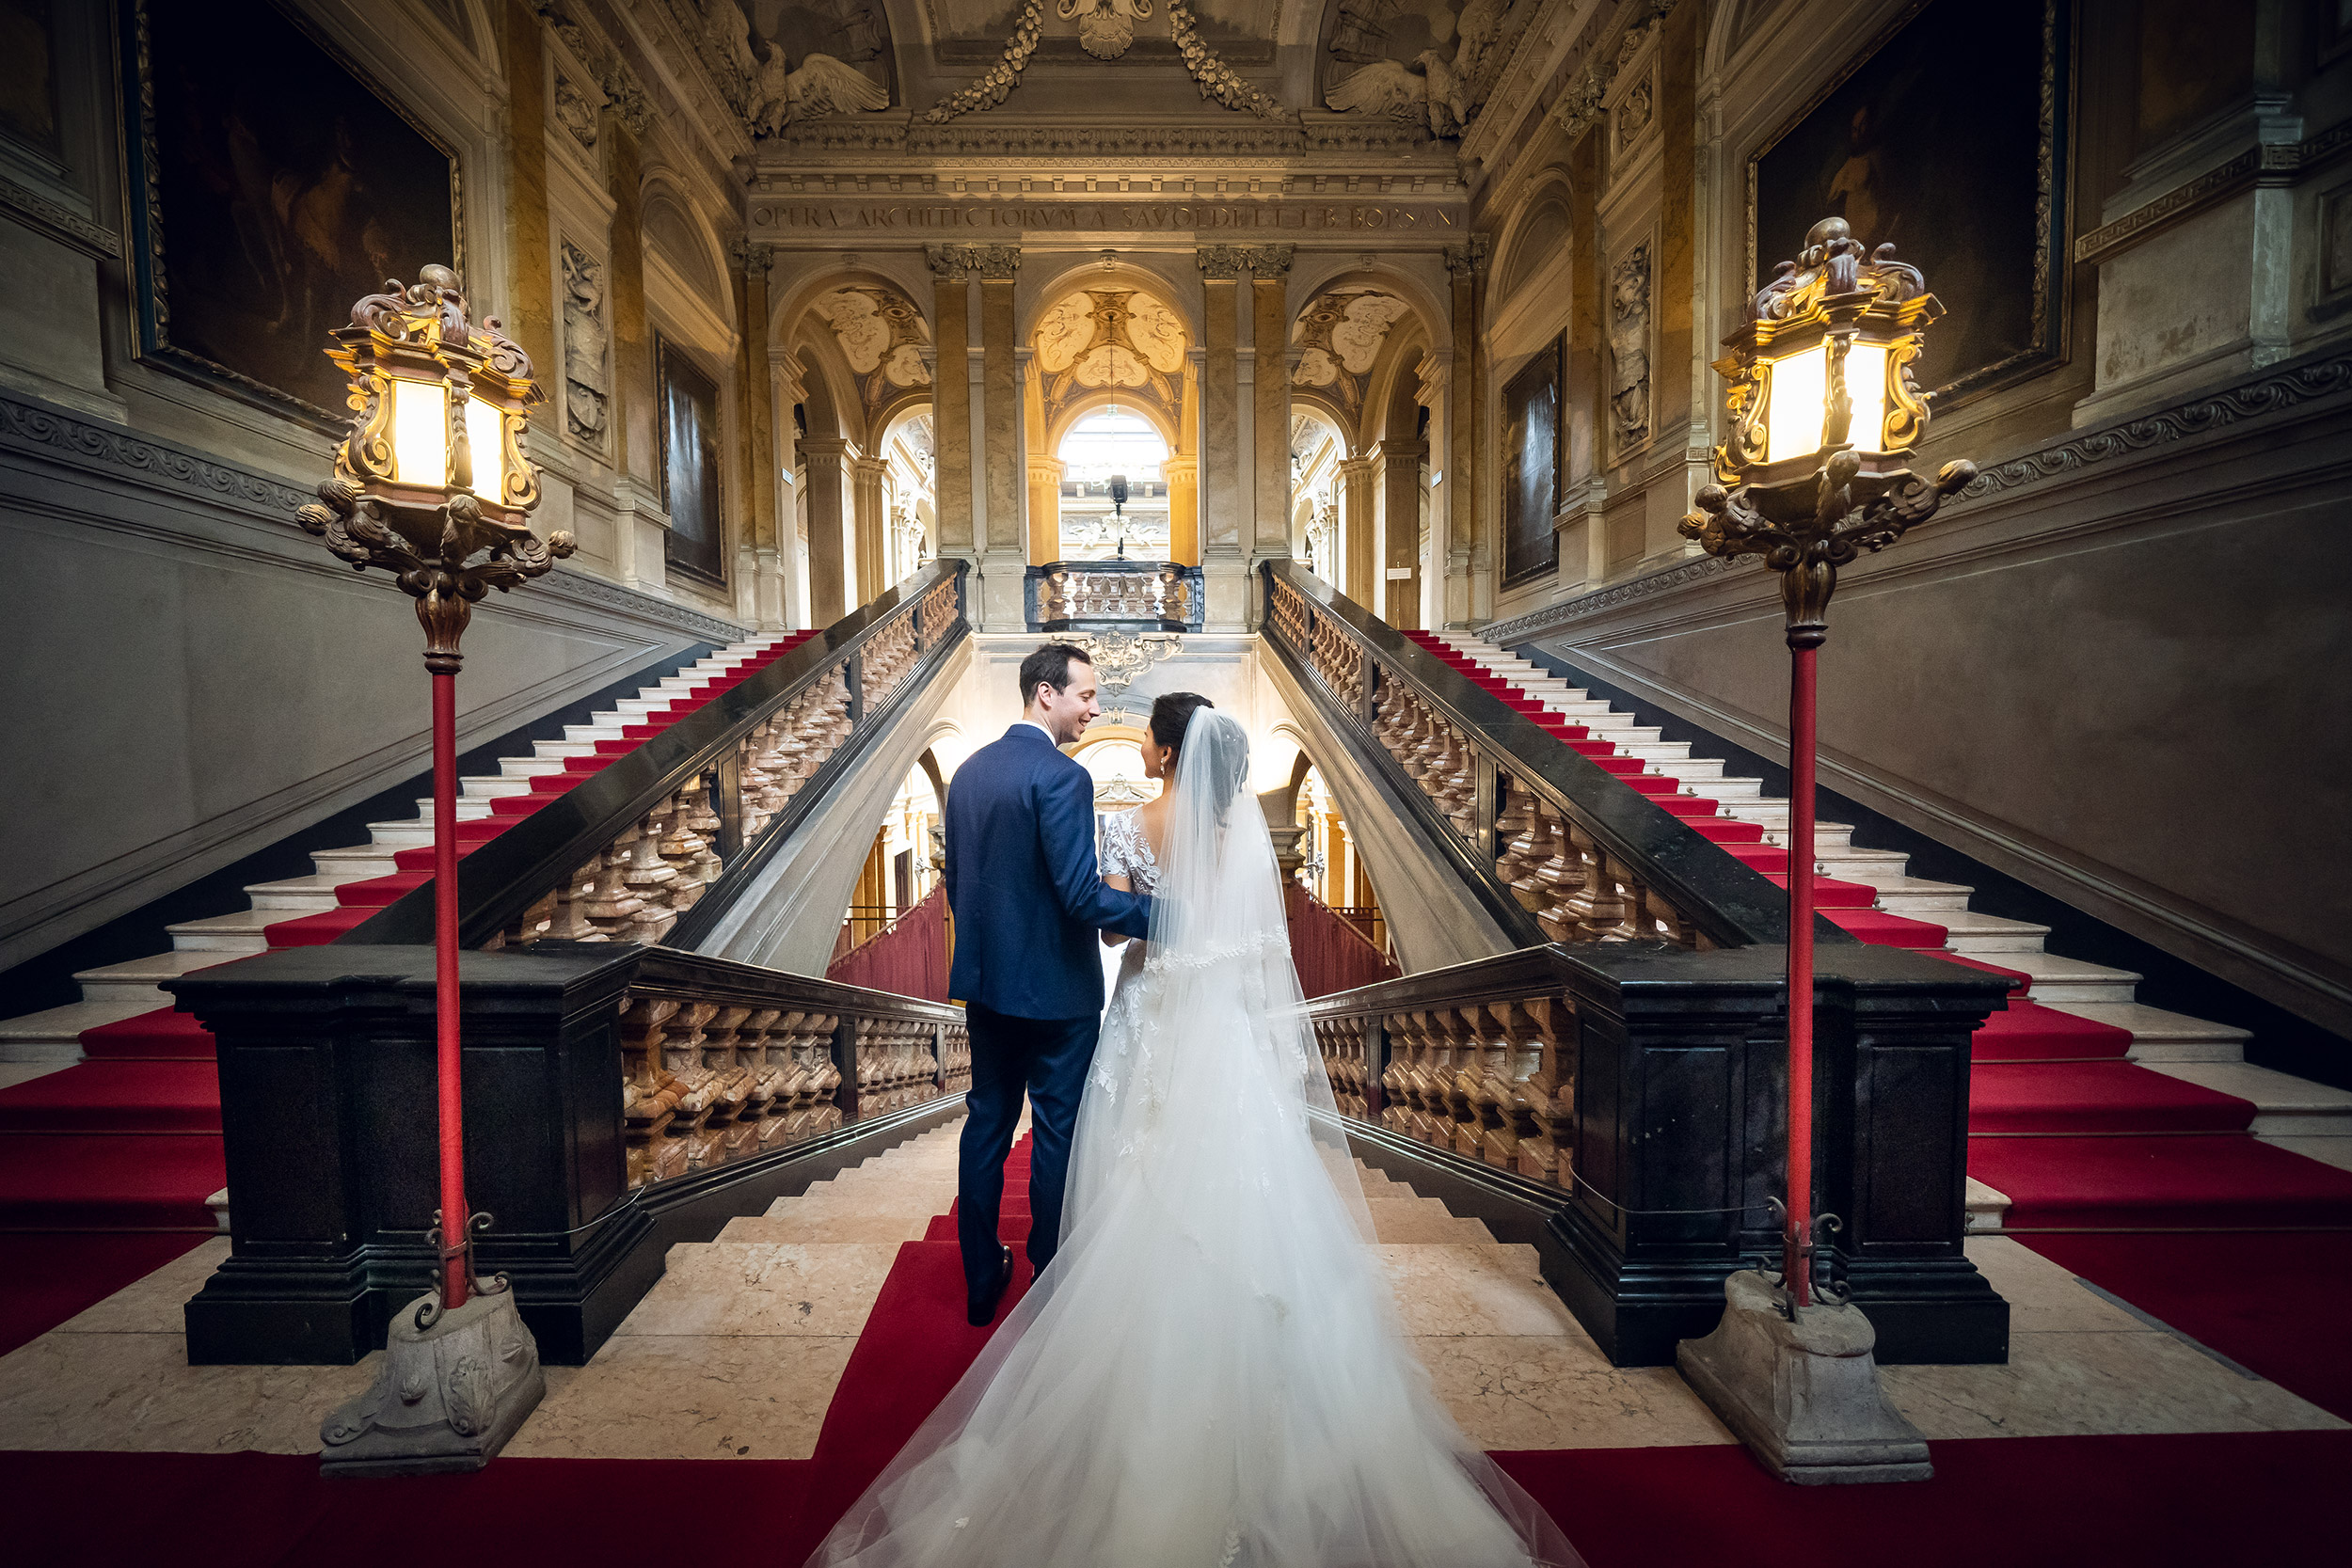 033 reportage sposi ritratto foto matrimonio wedding villa erba cernobbio lago como 1